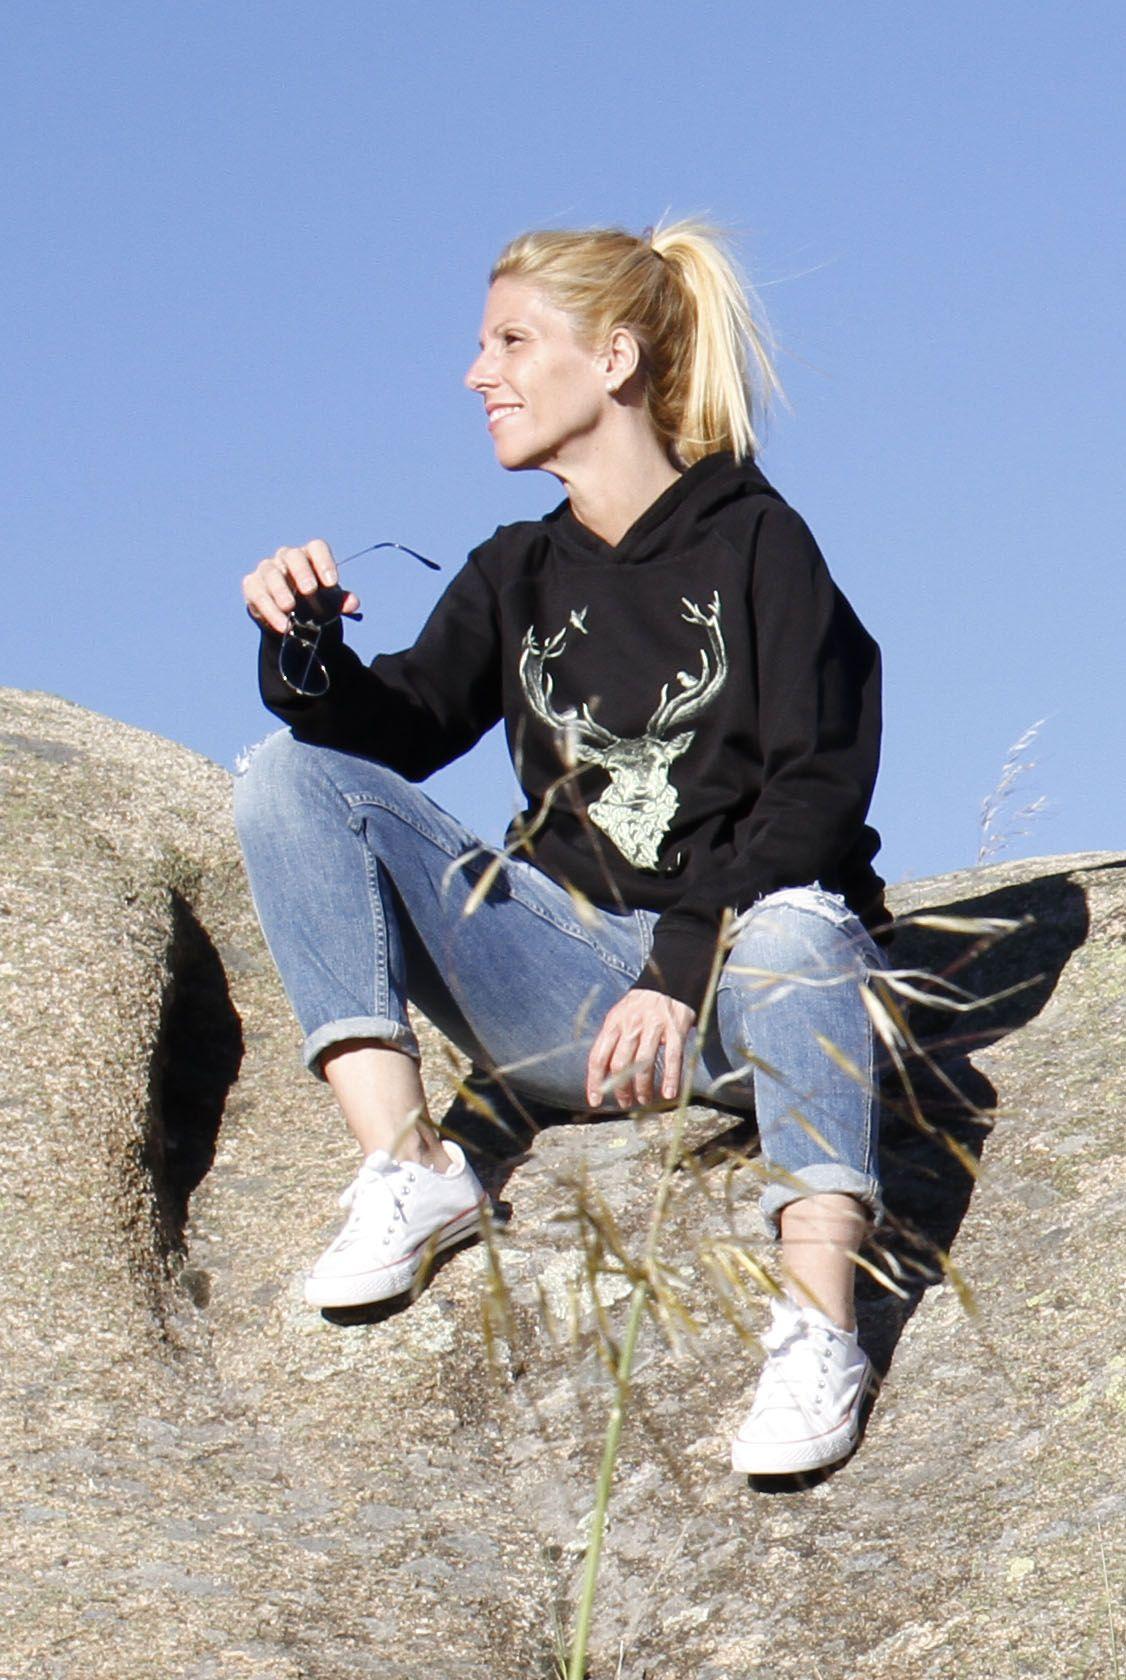 sudadera ciervo-algodon organico-sirem wild-moda sostenible-naturaleza-mujer